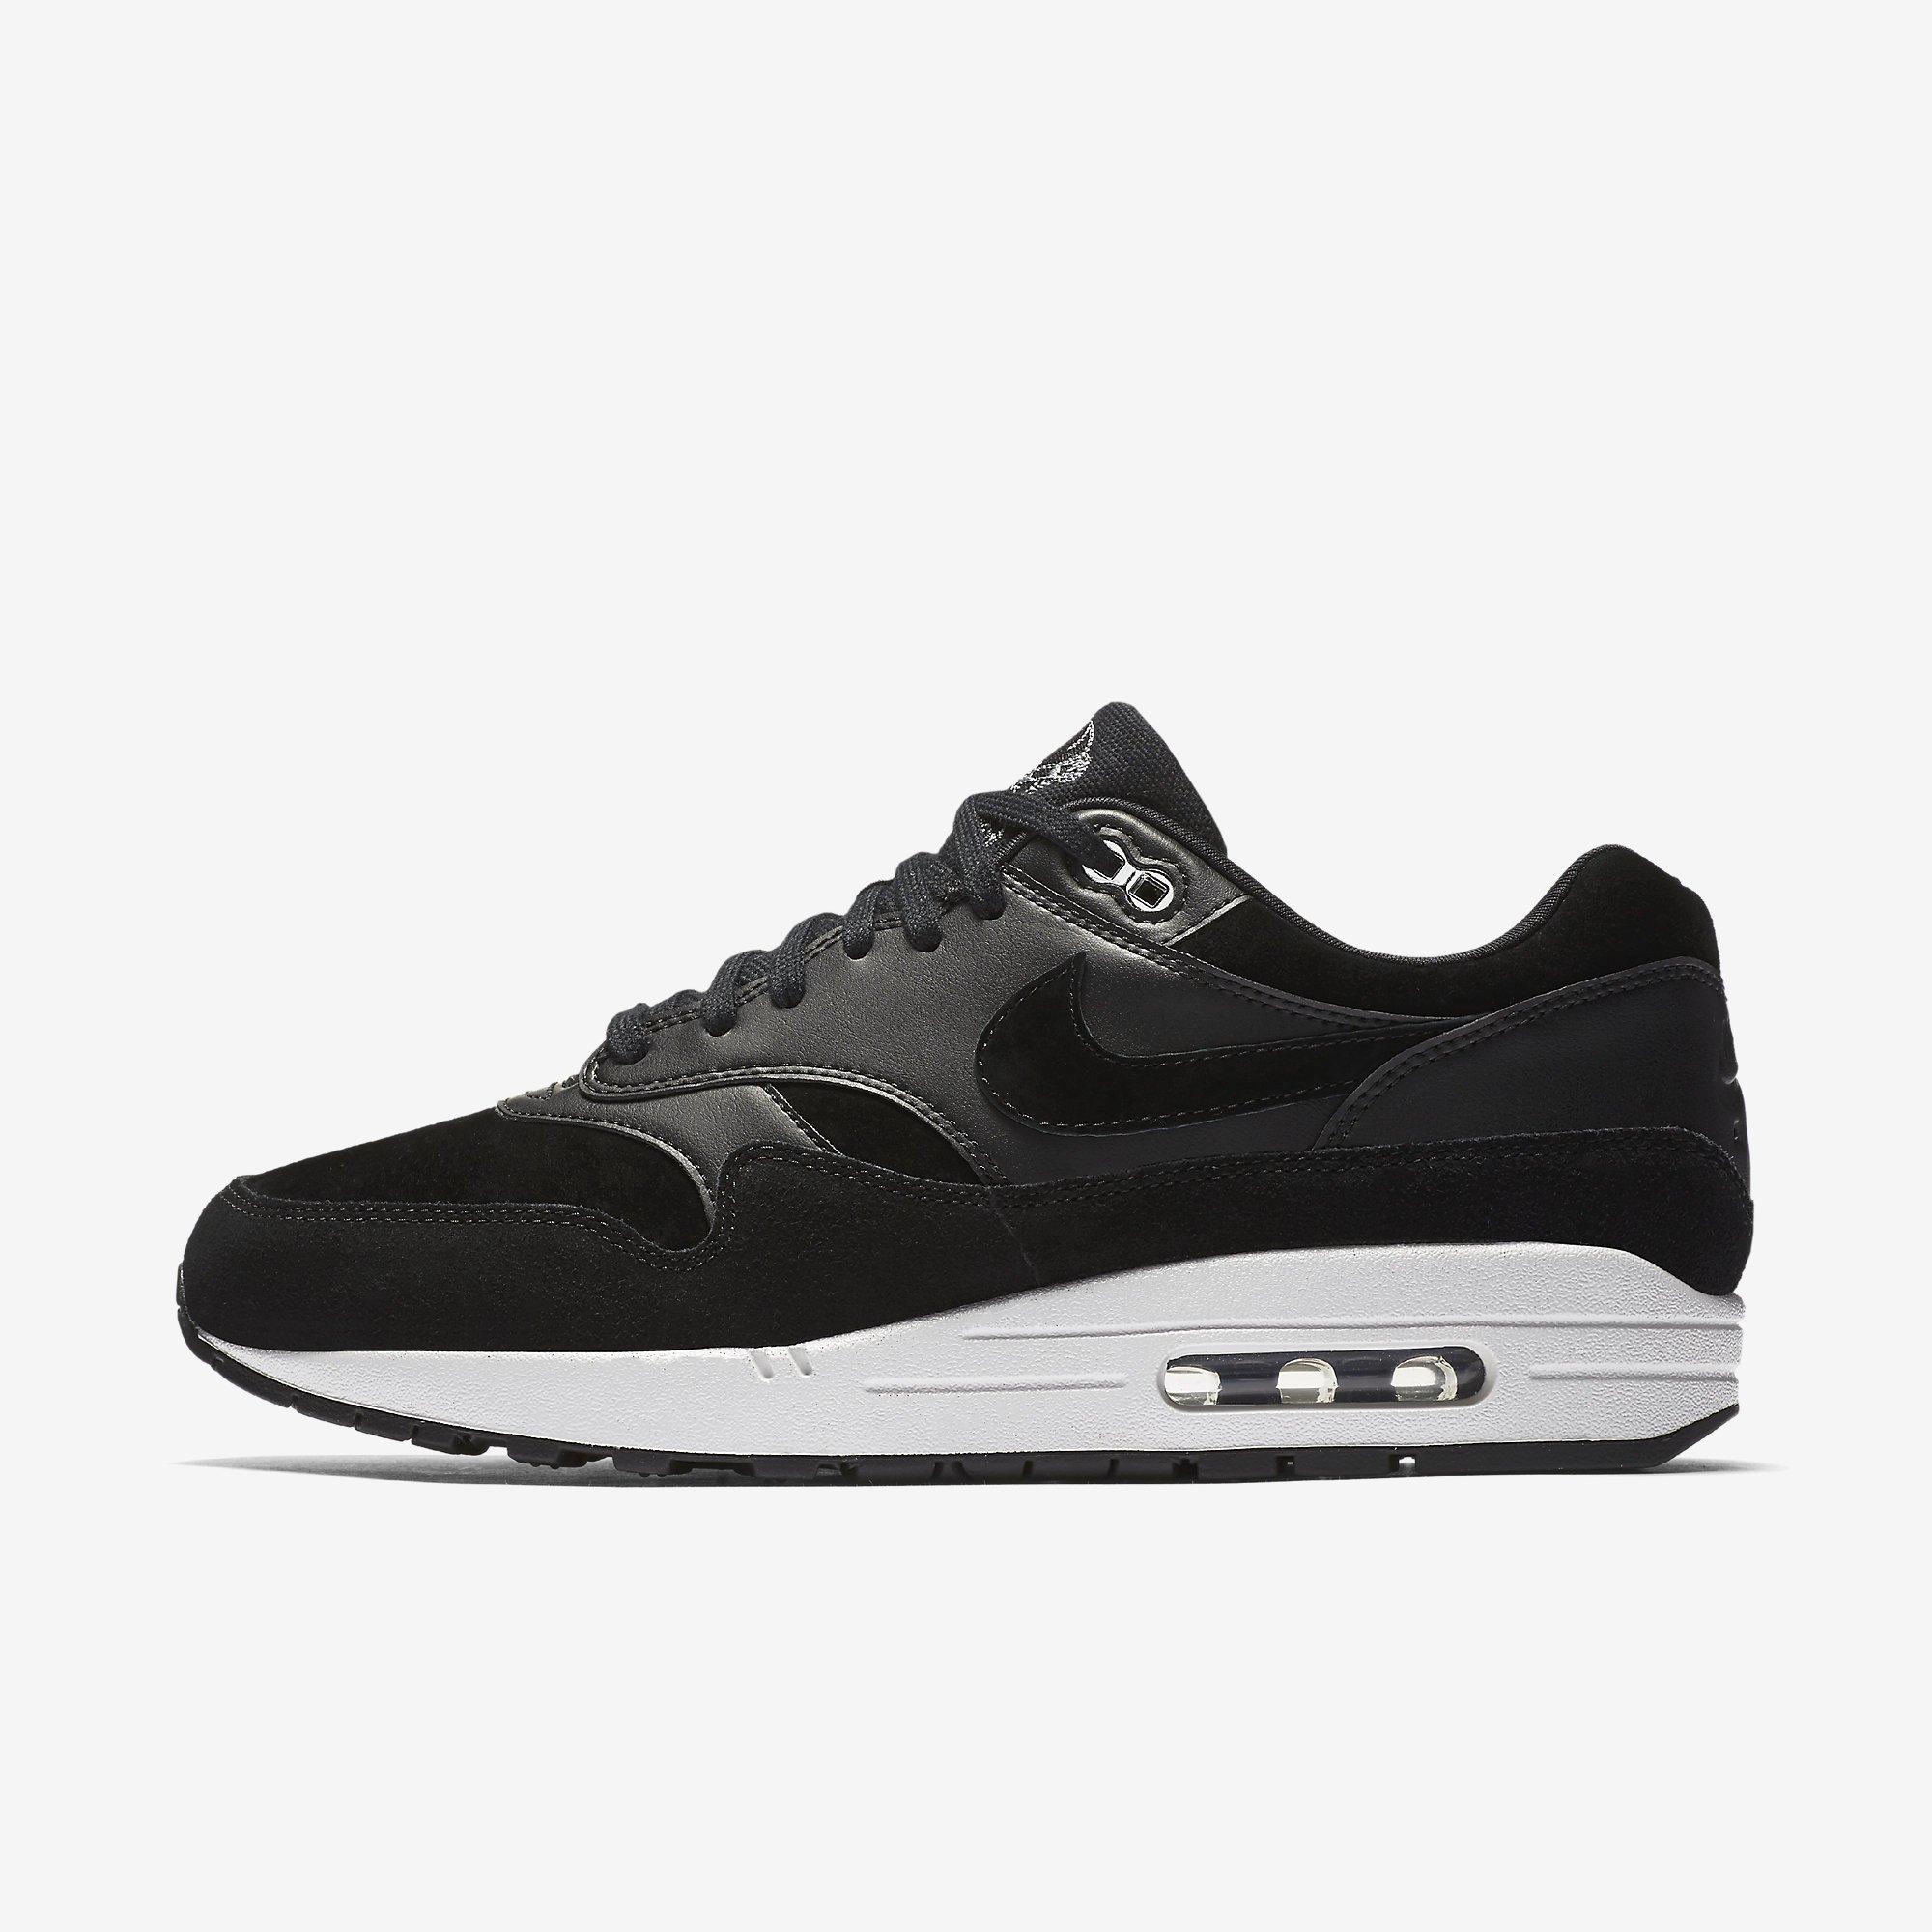 Size Skulls Mens Max Suede 10 Air Blackchrome Premium Nike 1 3qj5R4AL